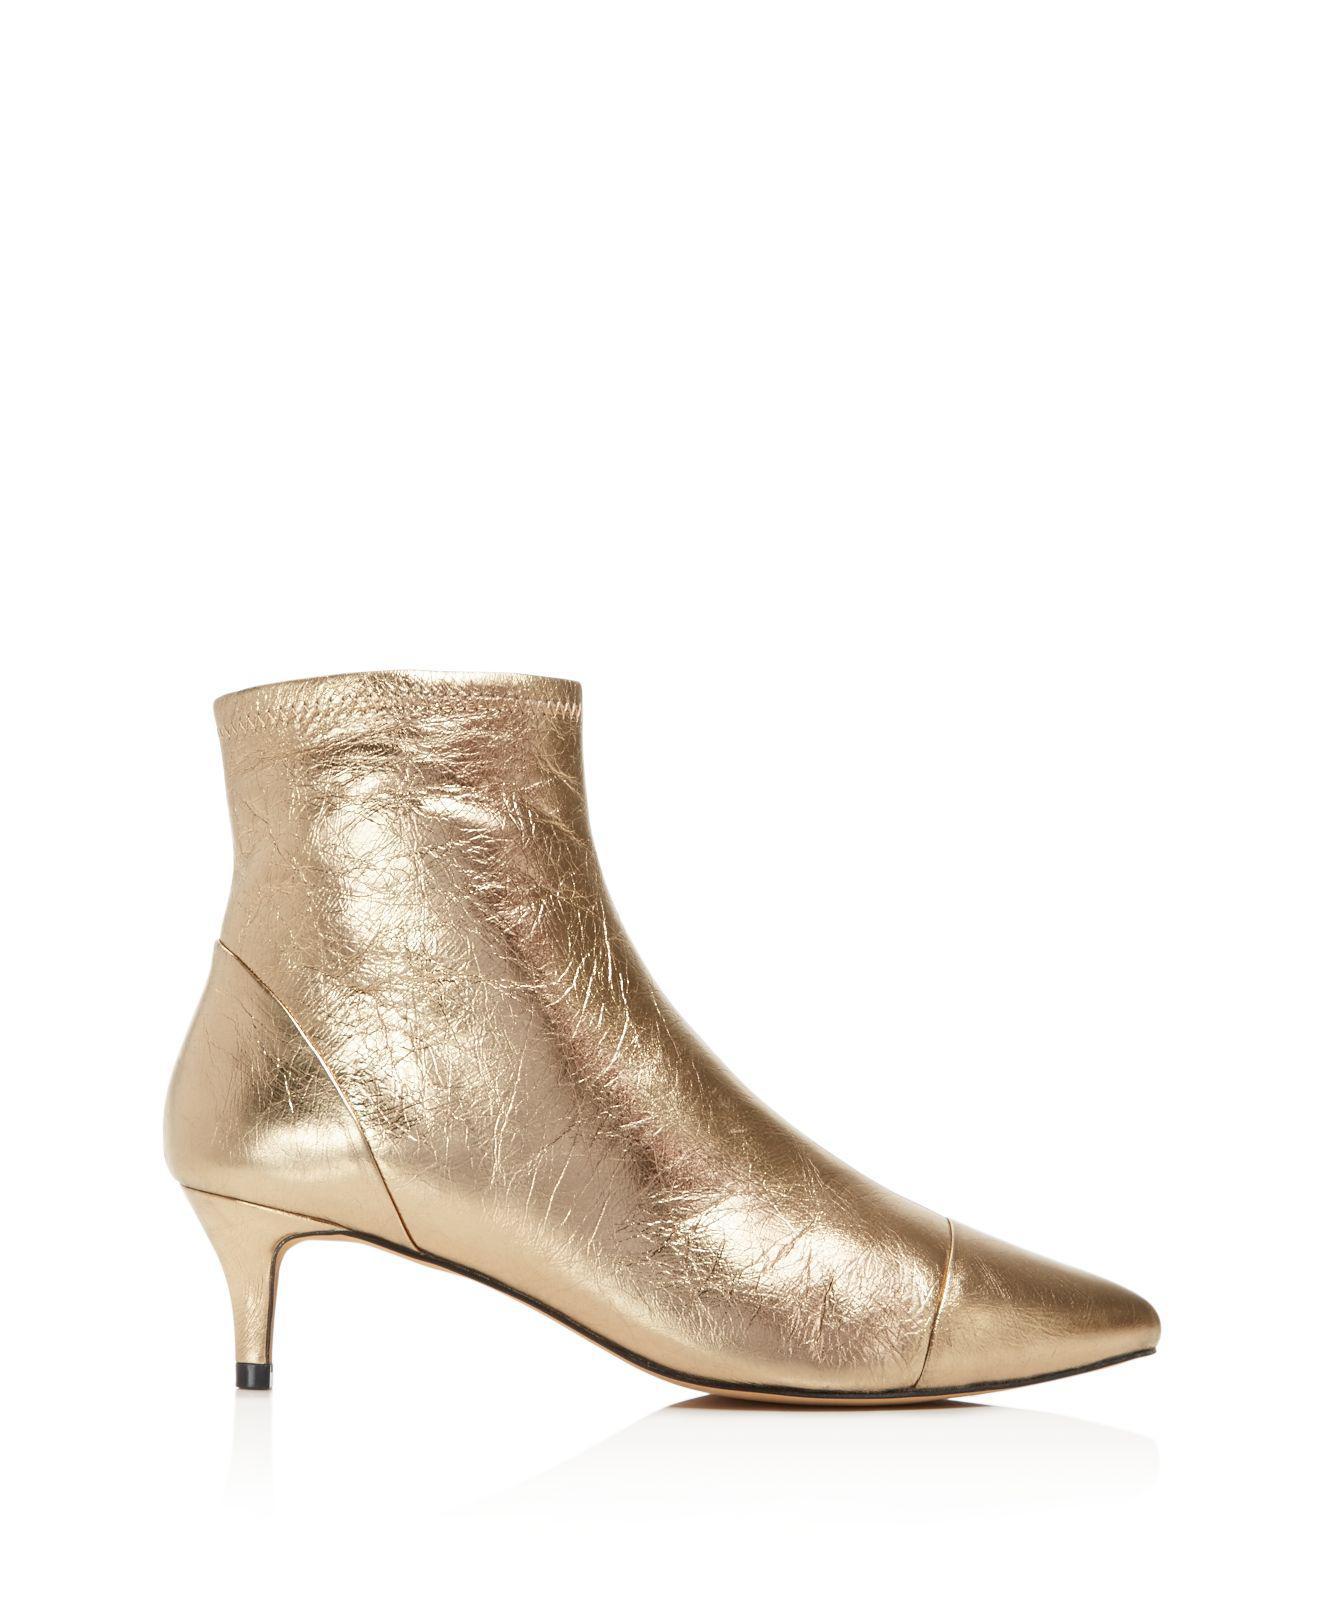 360beedb441 Rebecca Minkoff Siya Womens Boots Gold Metallic 7.5 US   5.5 UK ...